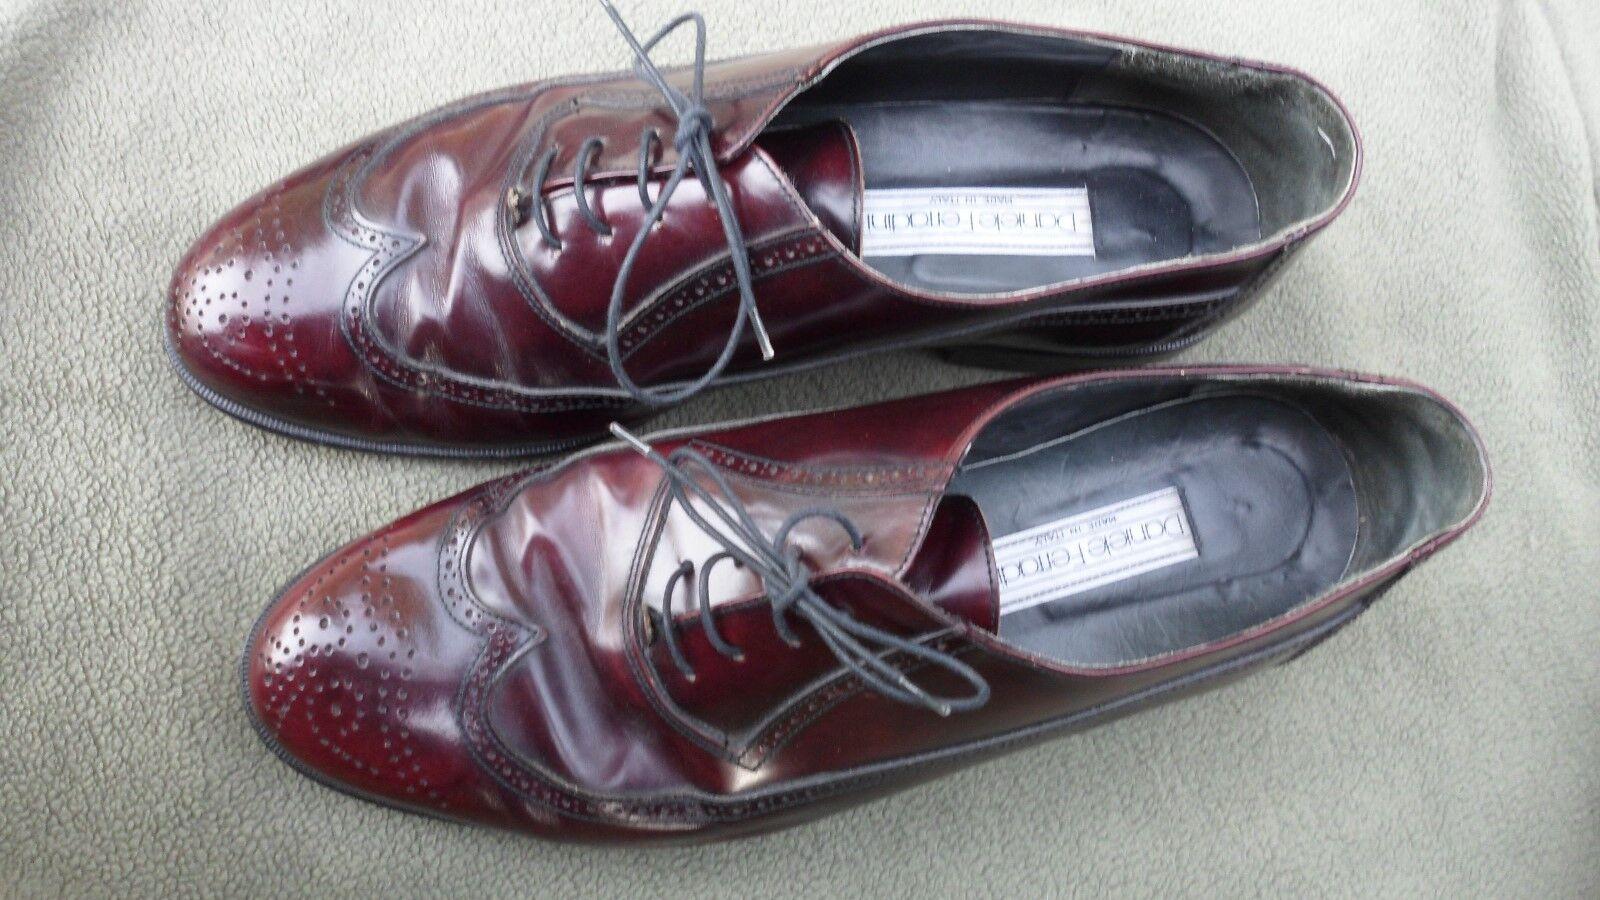 Men's DANIELE FERRADINI Brown Leather Brogue Wing Tip Oxfords - Size 11